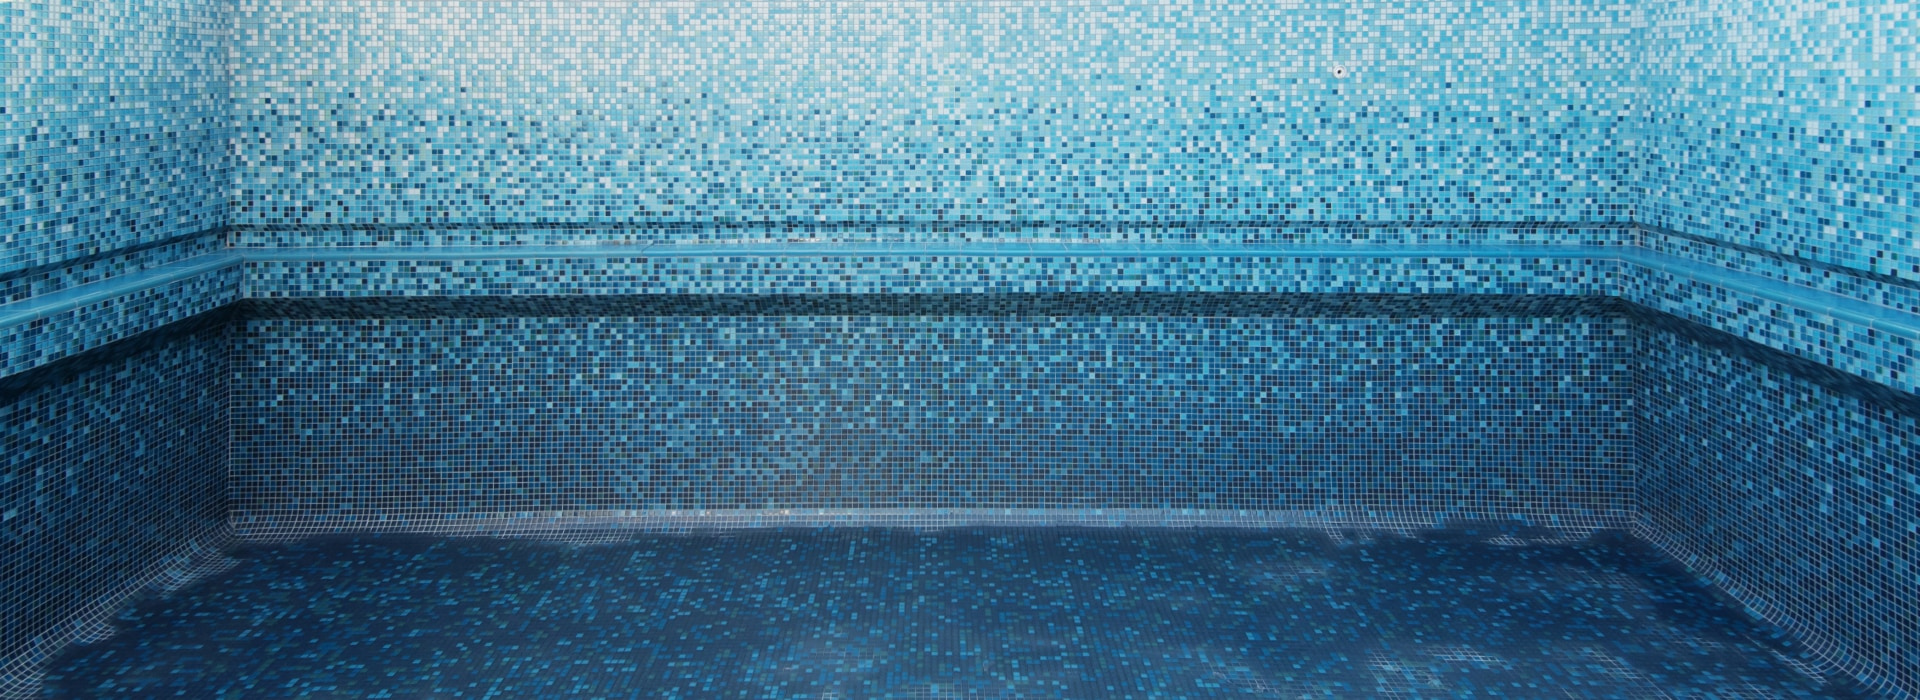 Gradient Pool in Chilliwack